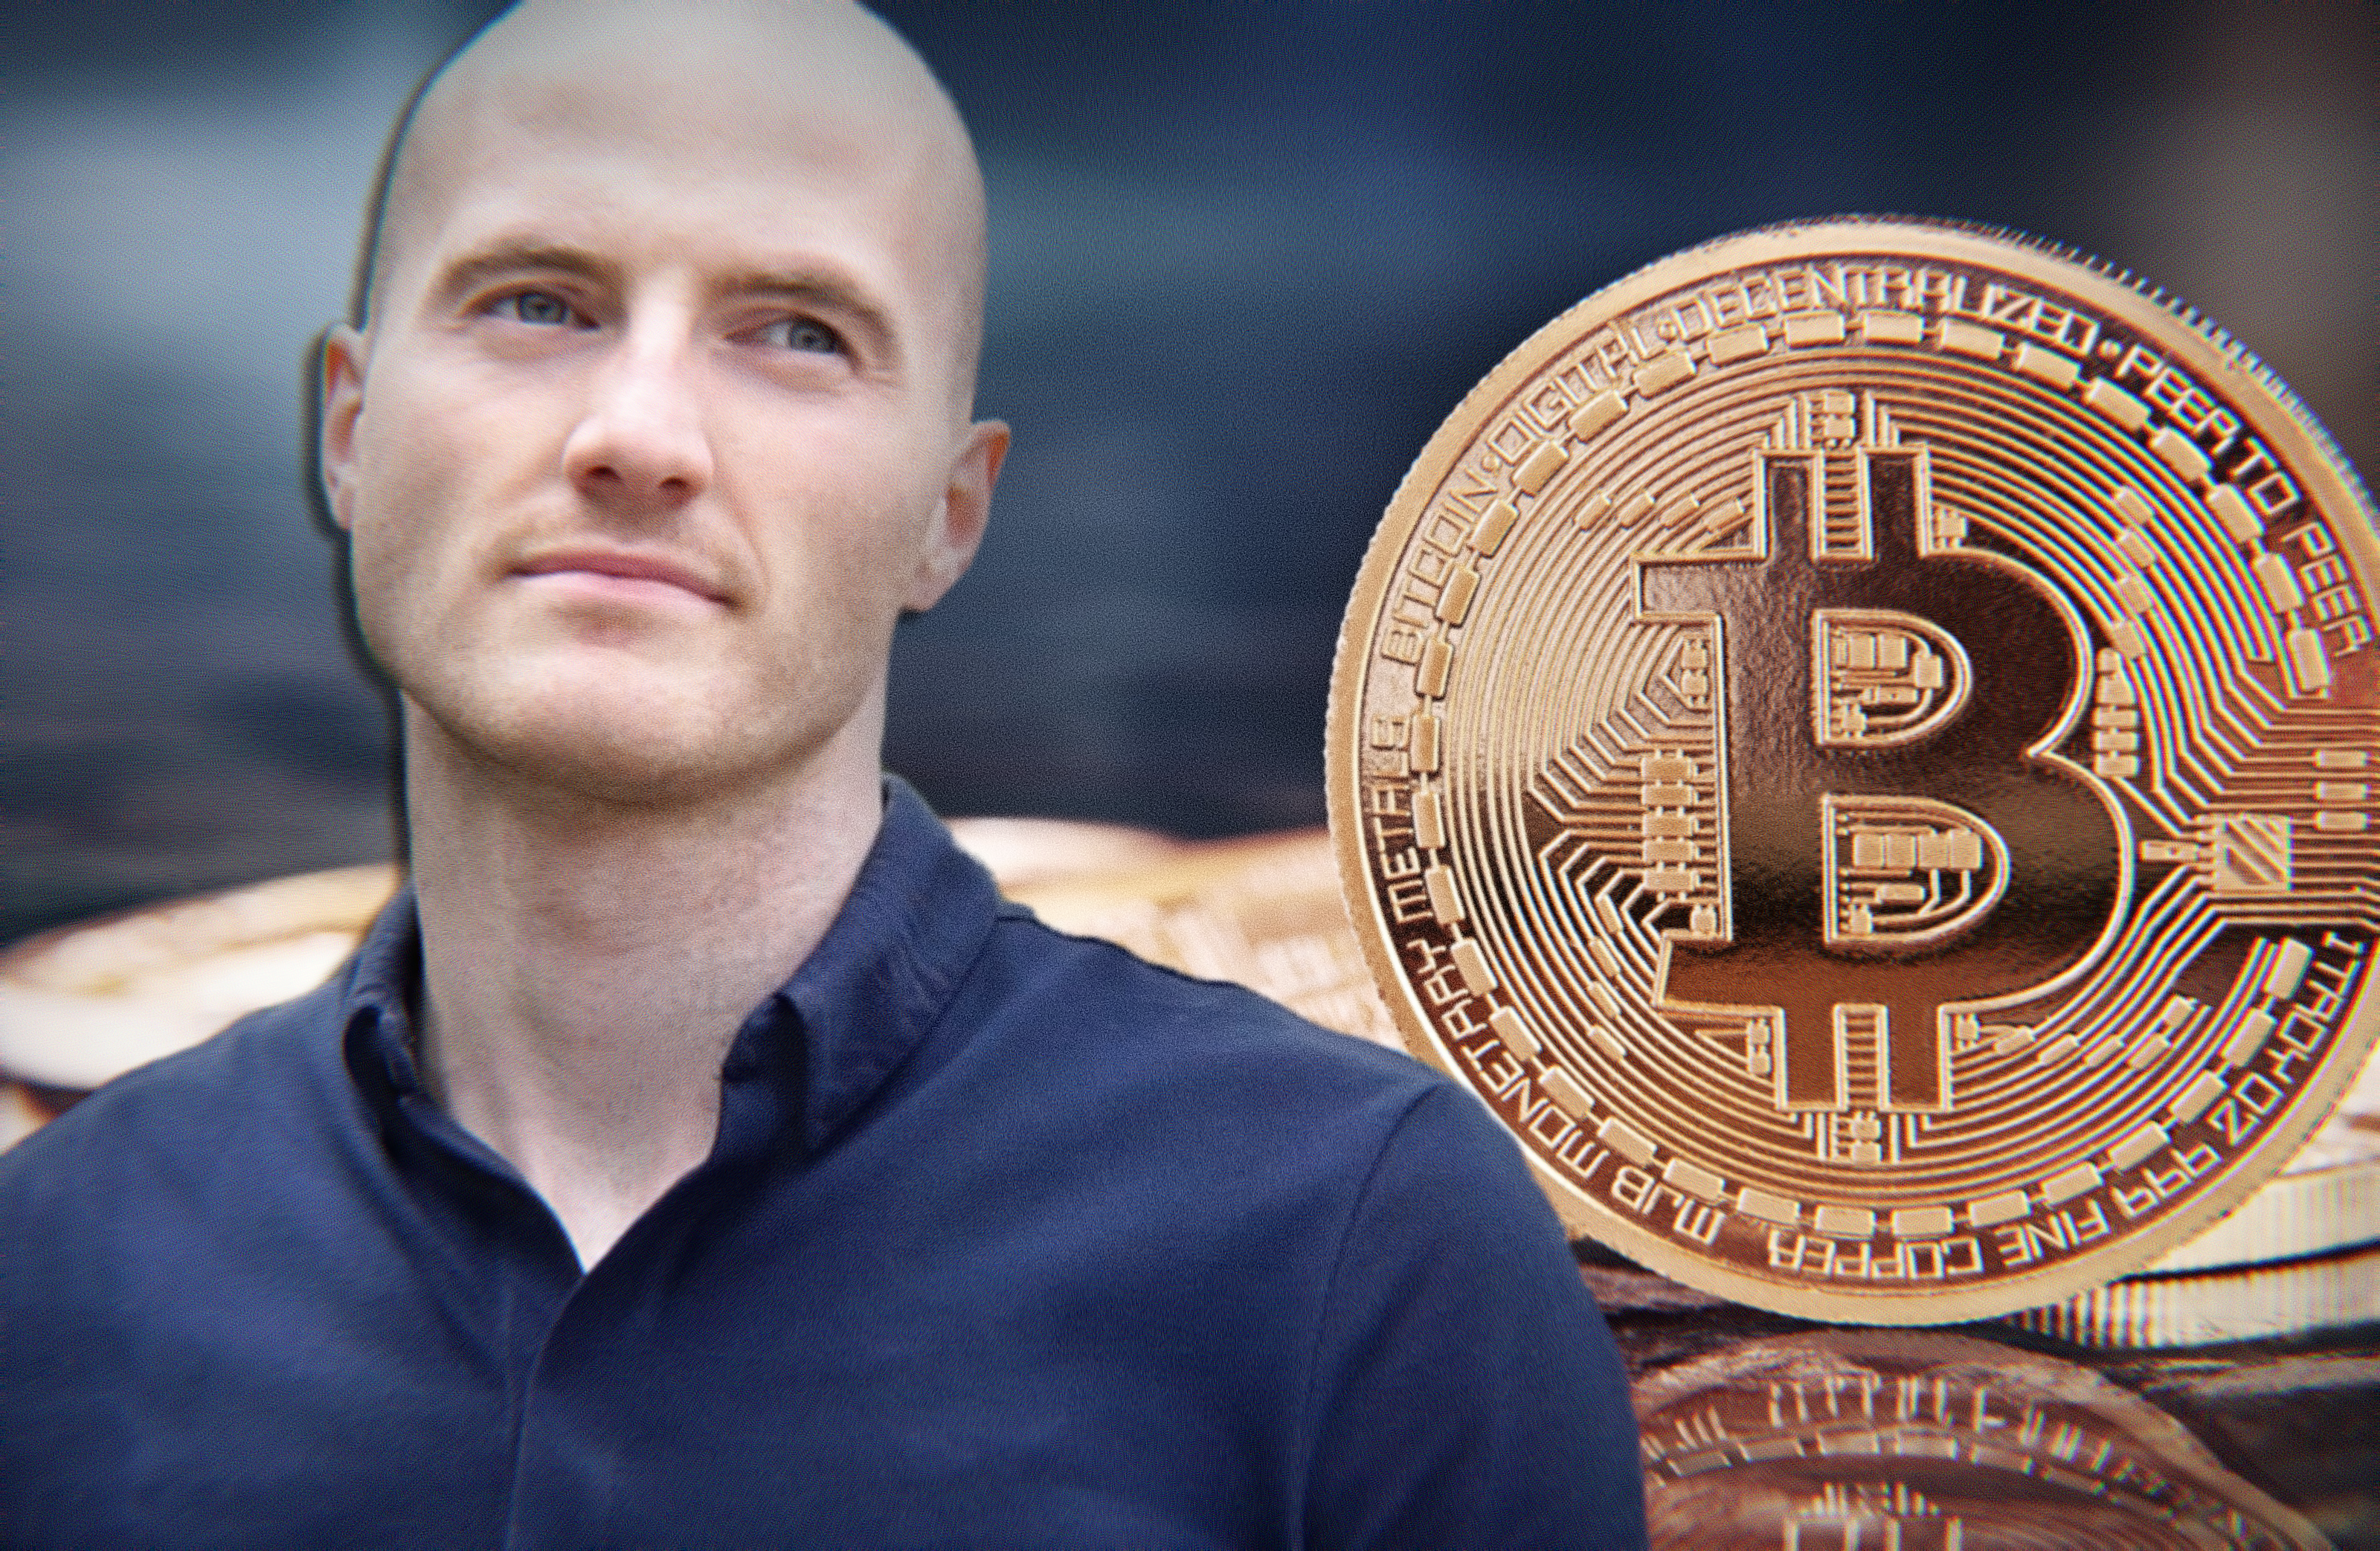 Billionaire James Richman Invests in Bitcoin